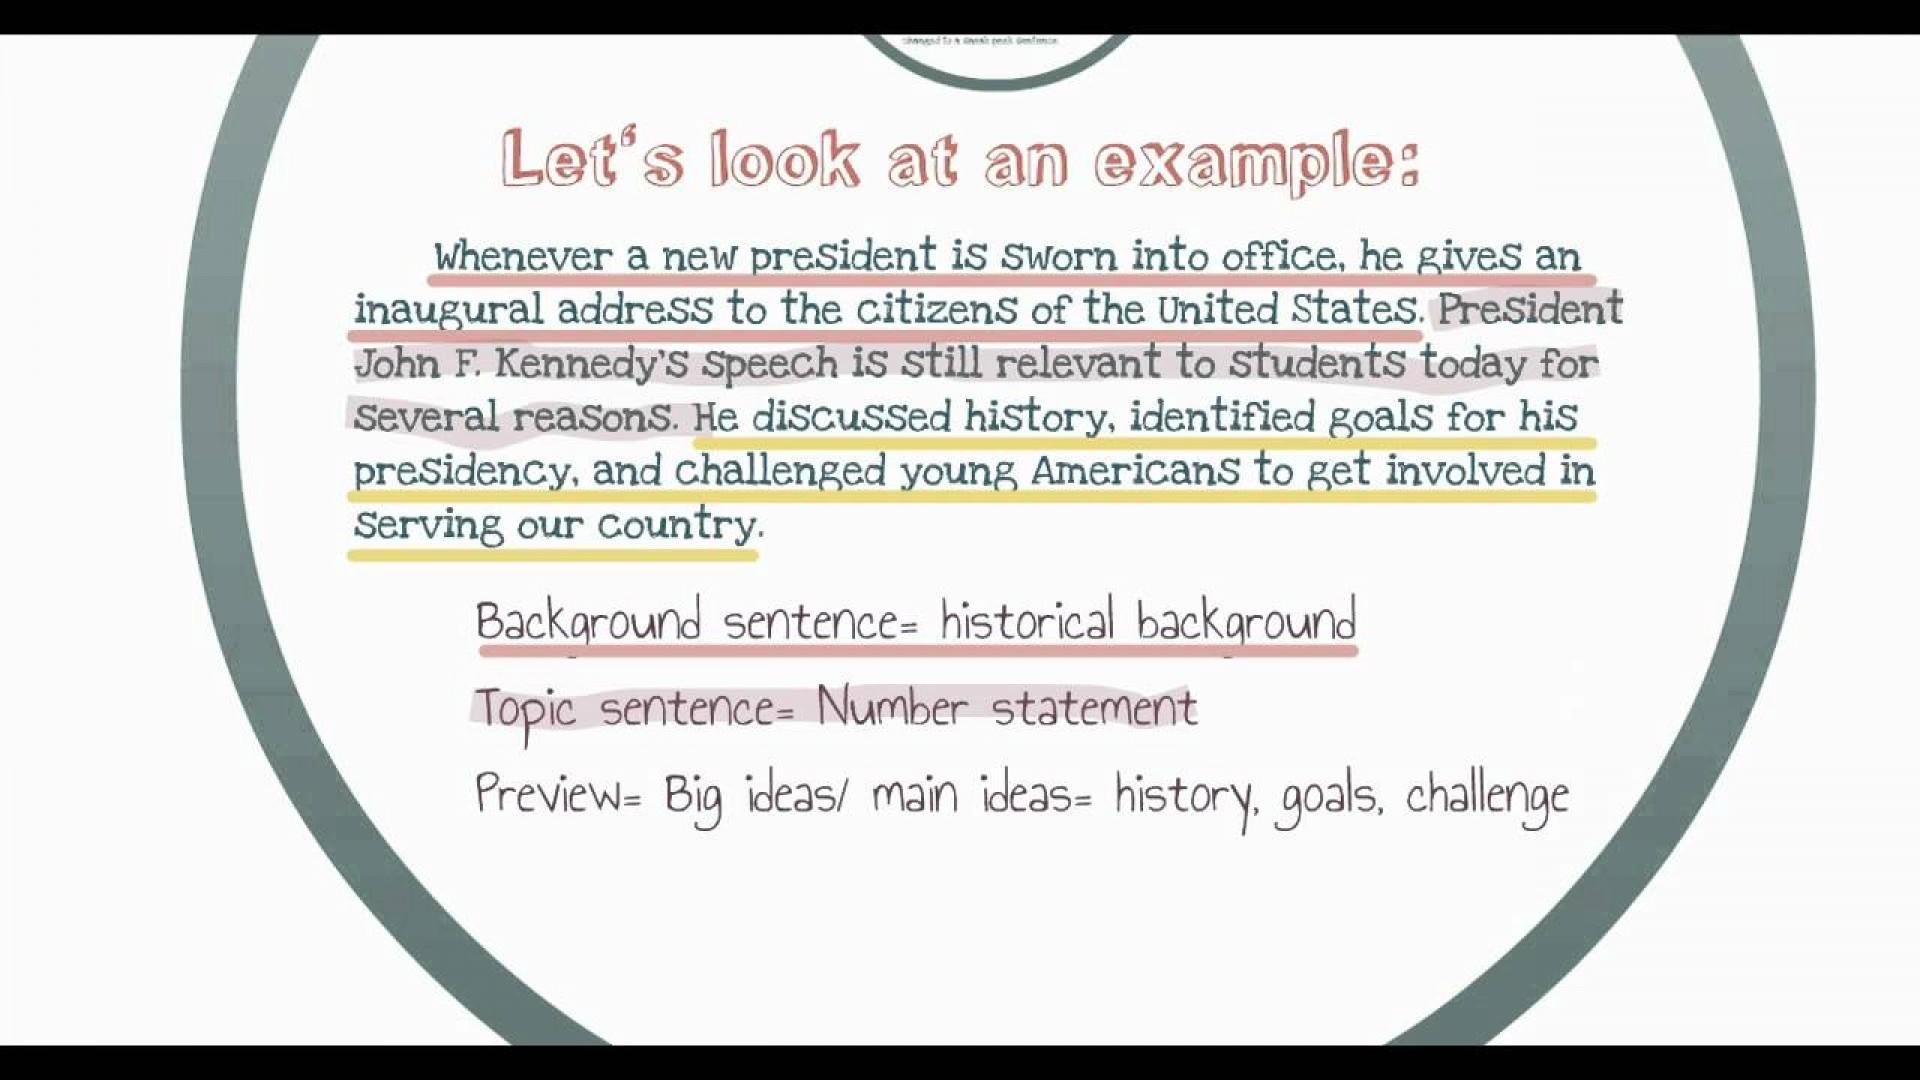 004 Maxresdefault Essay Introduction Paragraph Stupendous Literary Example Argumentative Sample 1920